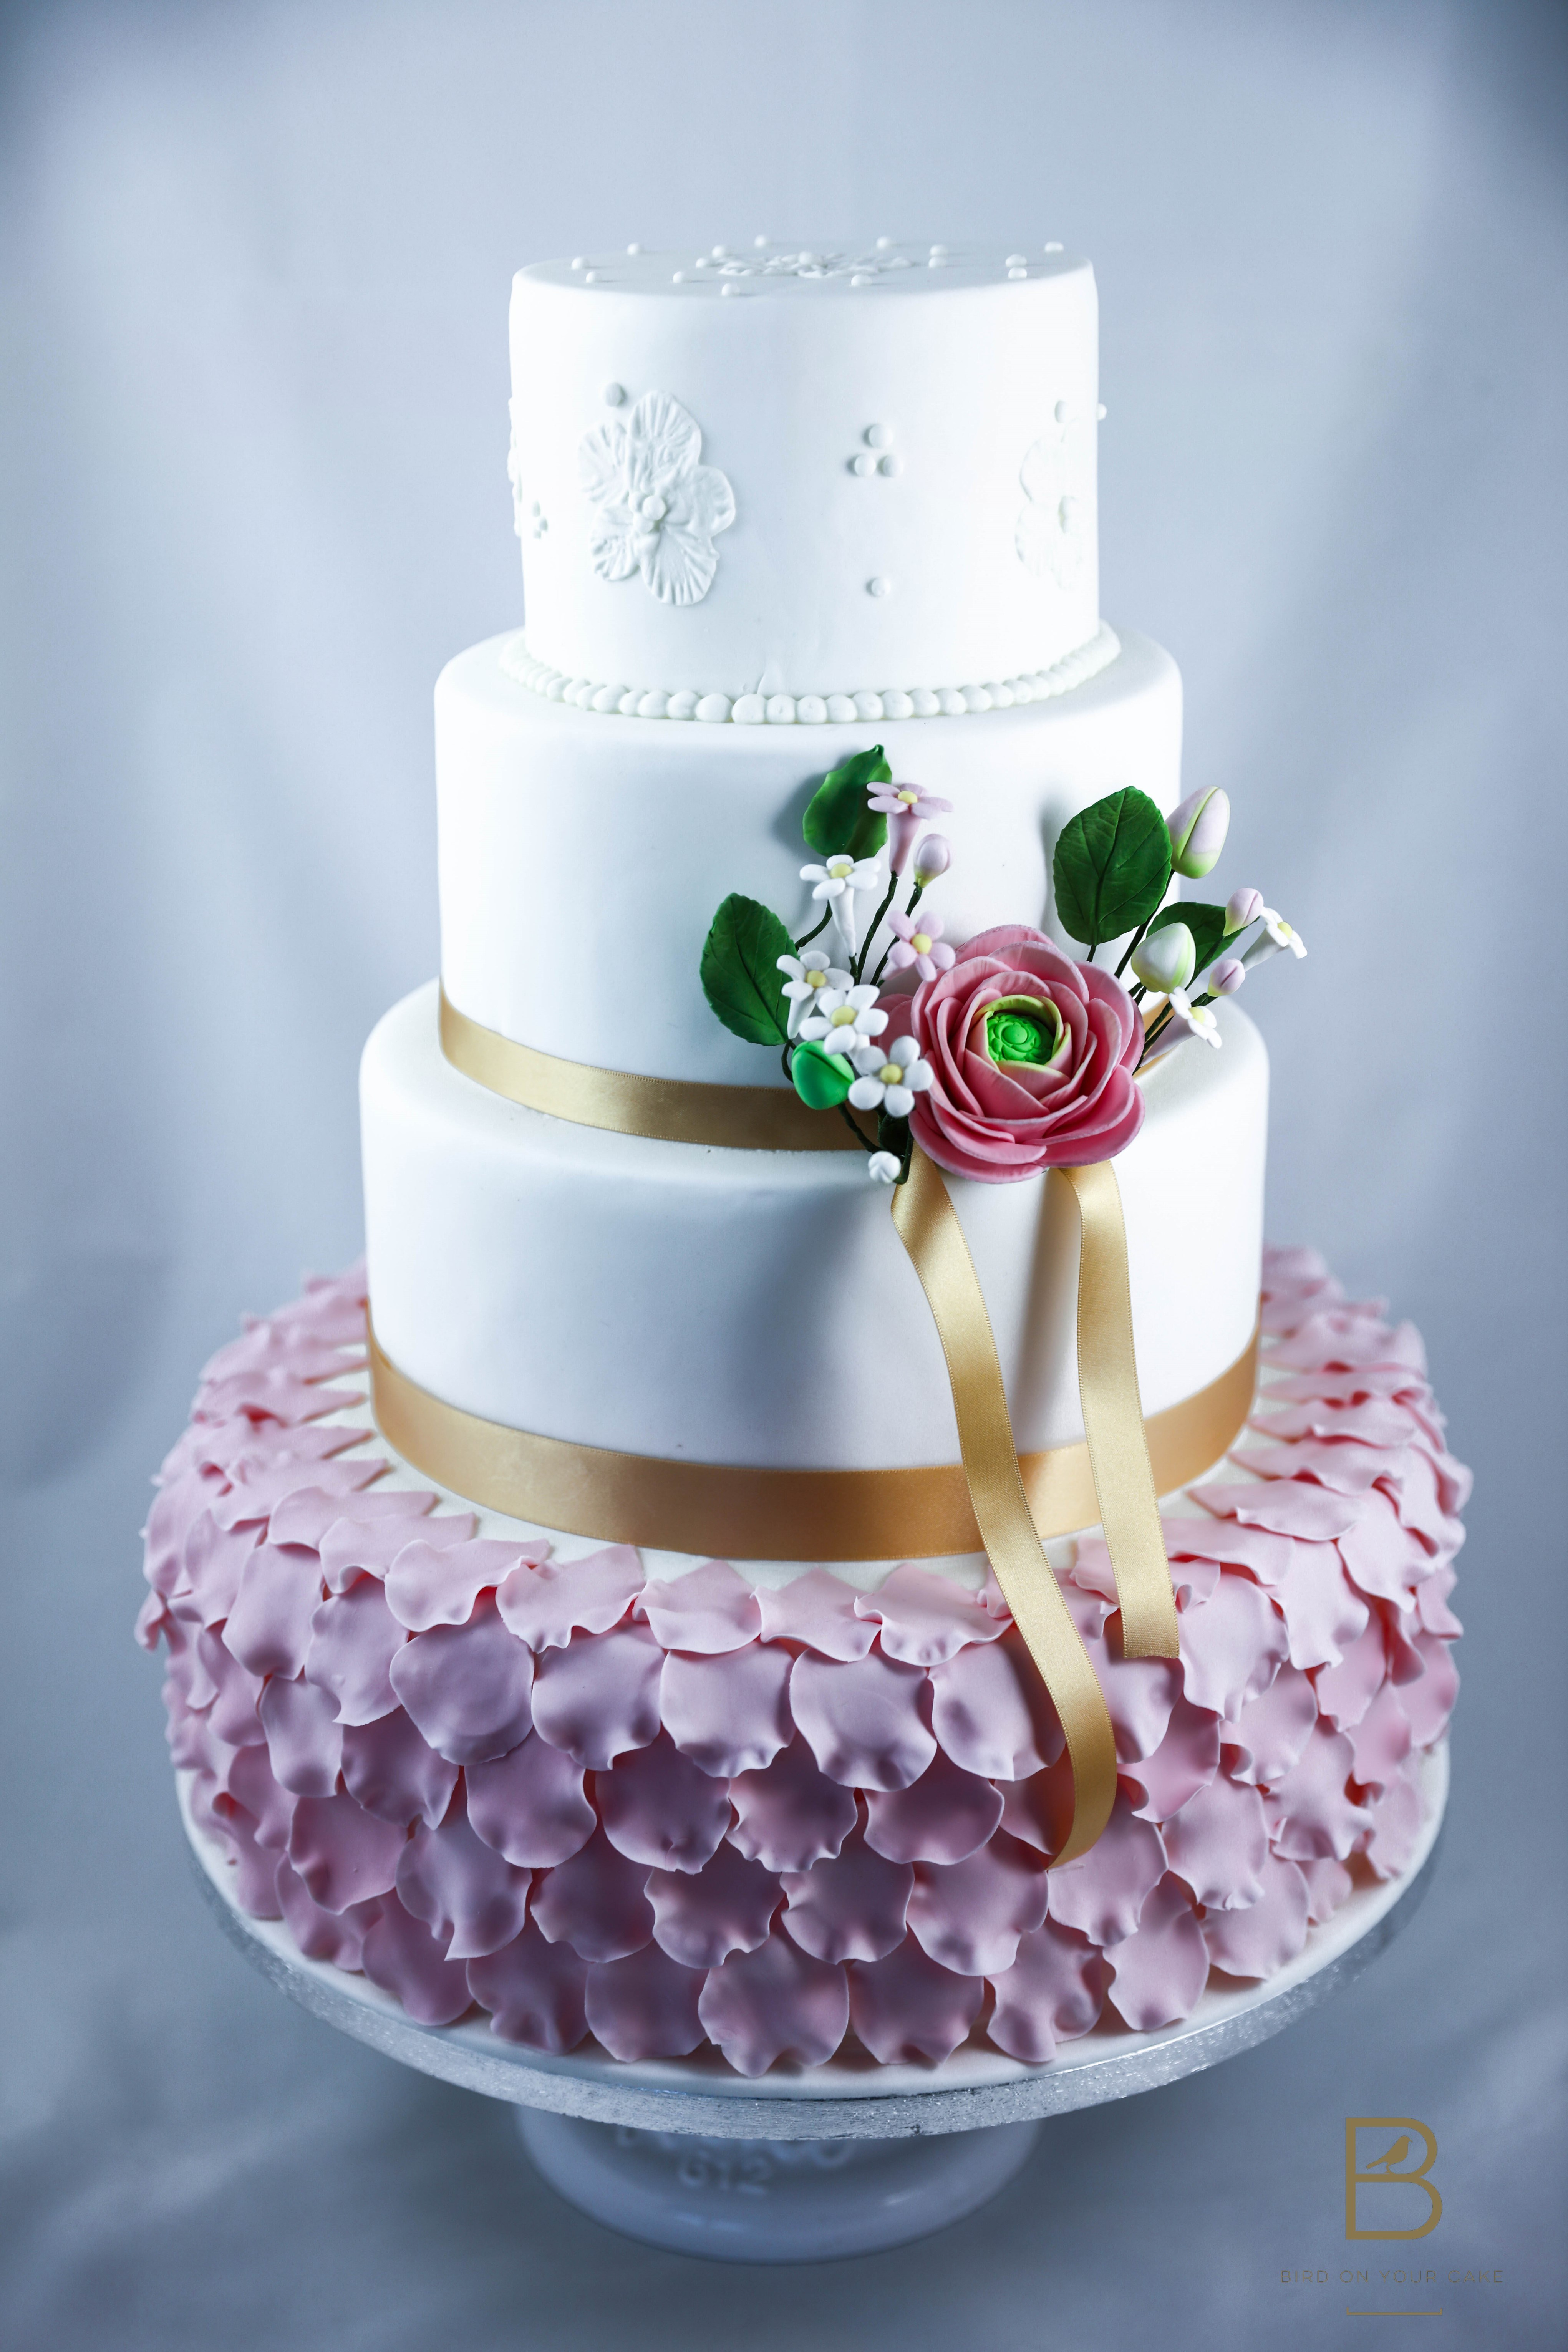 White wedding cake with pink ruffles